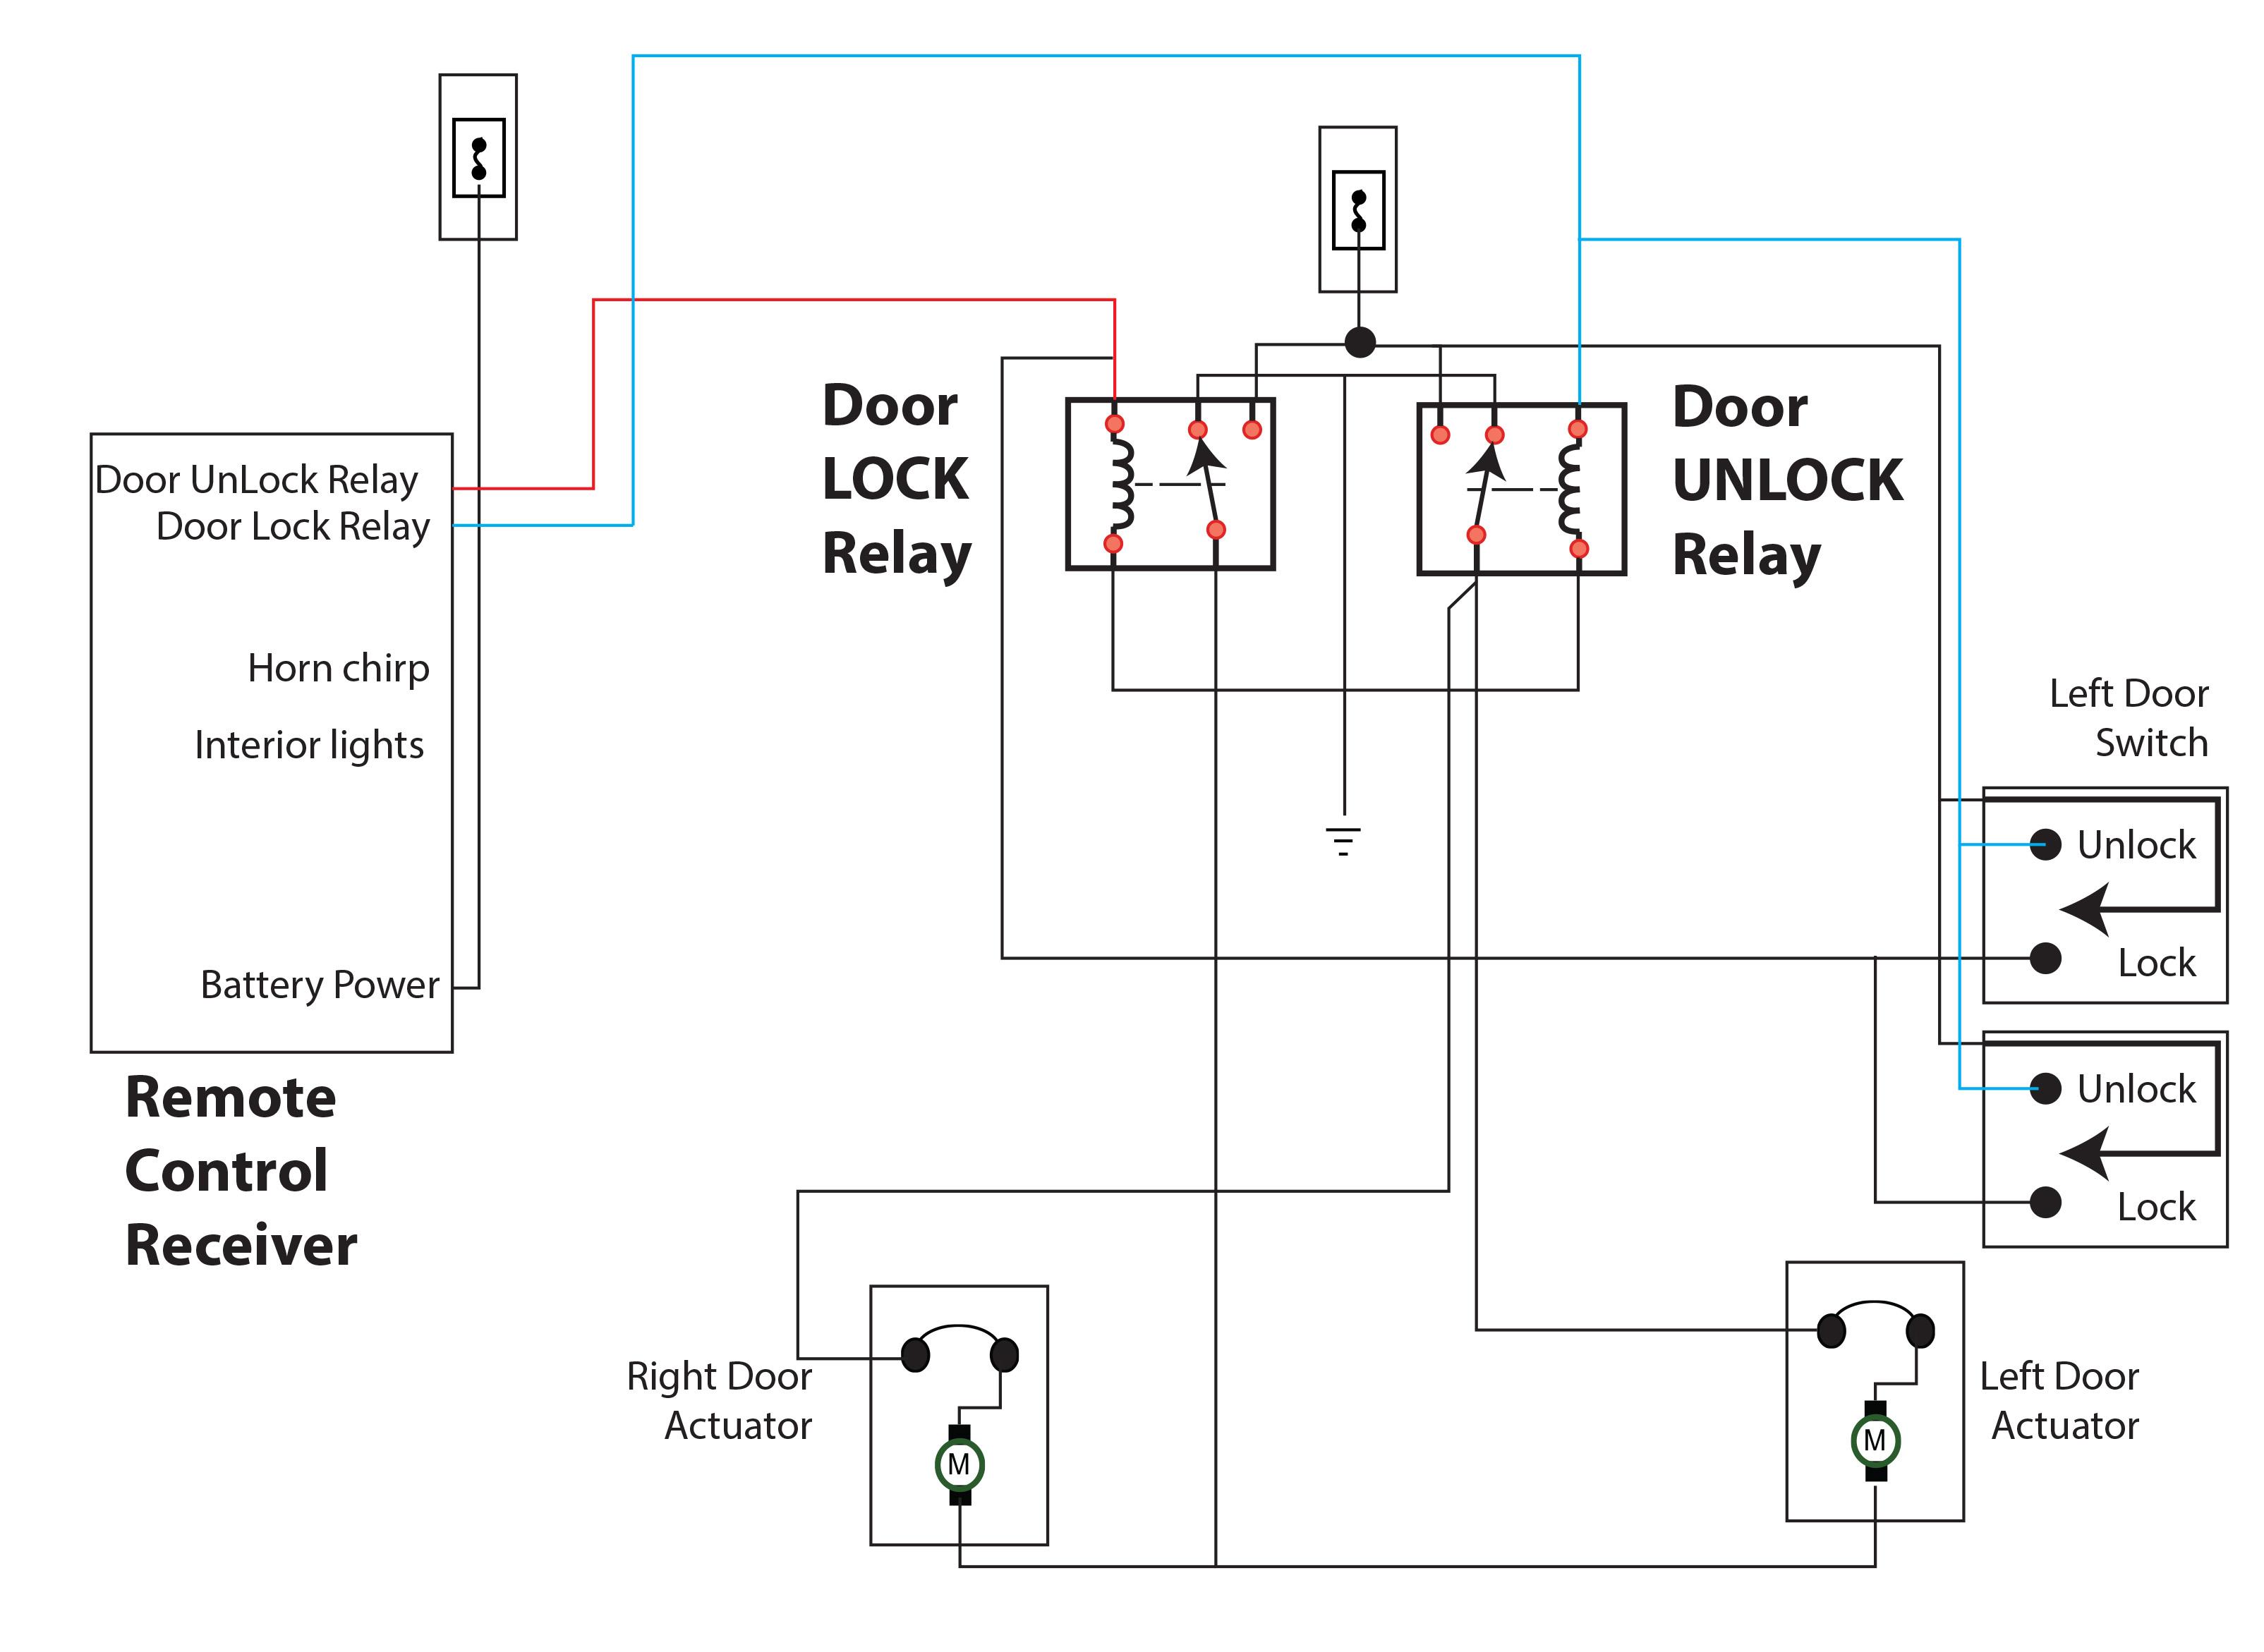 power door locks don't work — ricks free auto repair advice ricks free auto  repair advice | automotive repair tips and how-to  rick's free auto repair advice